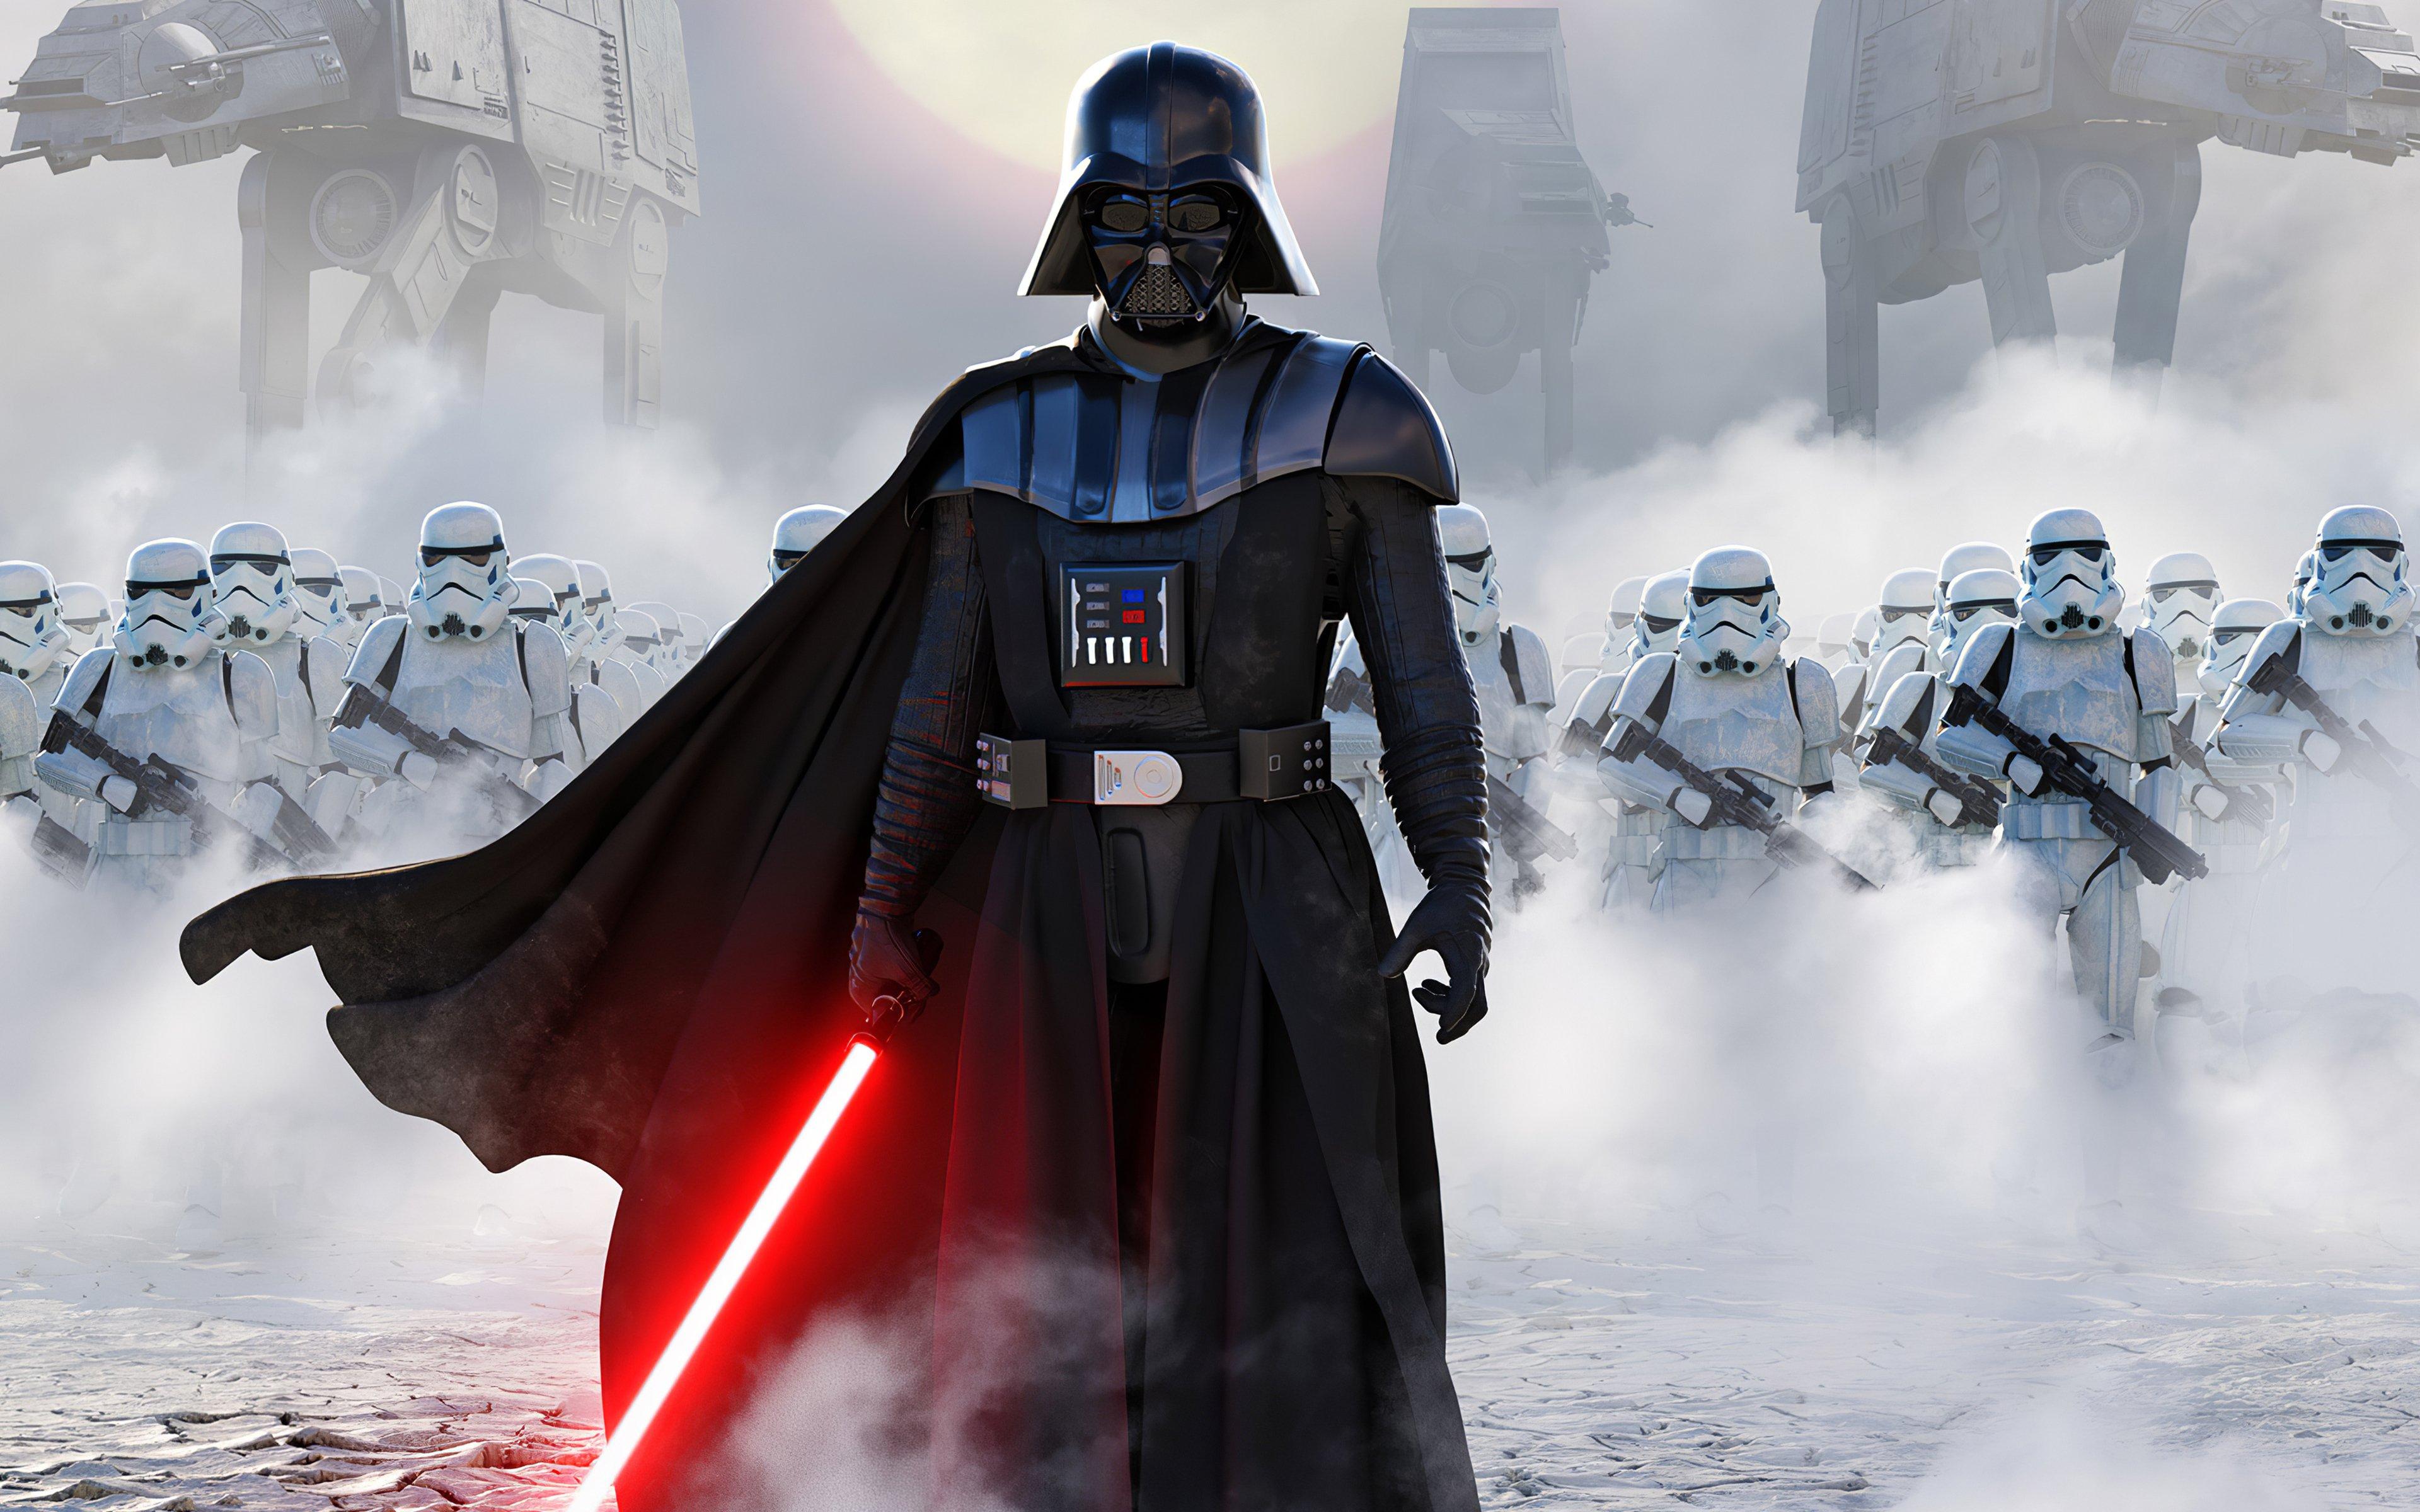 Fondos de pantalla Marcha Imperial Star Wars